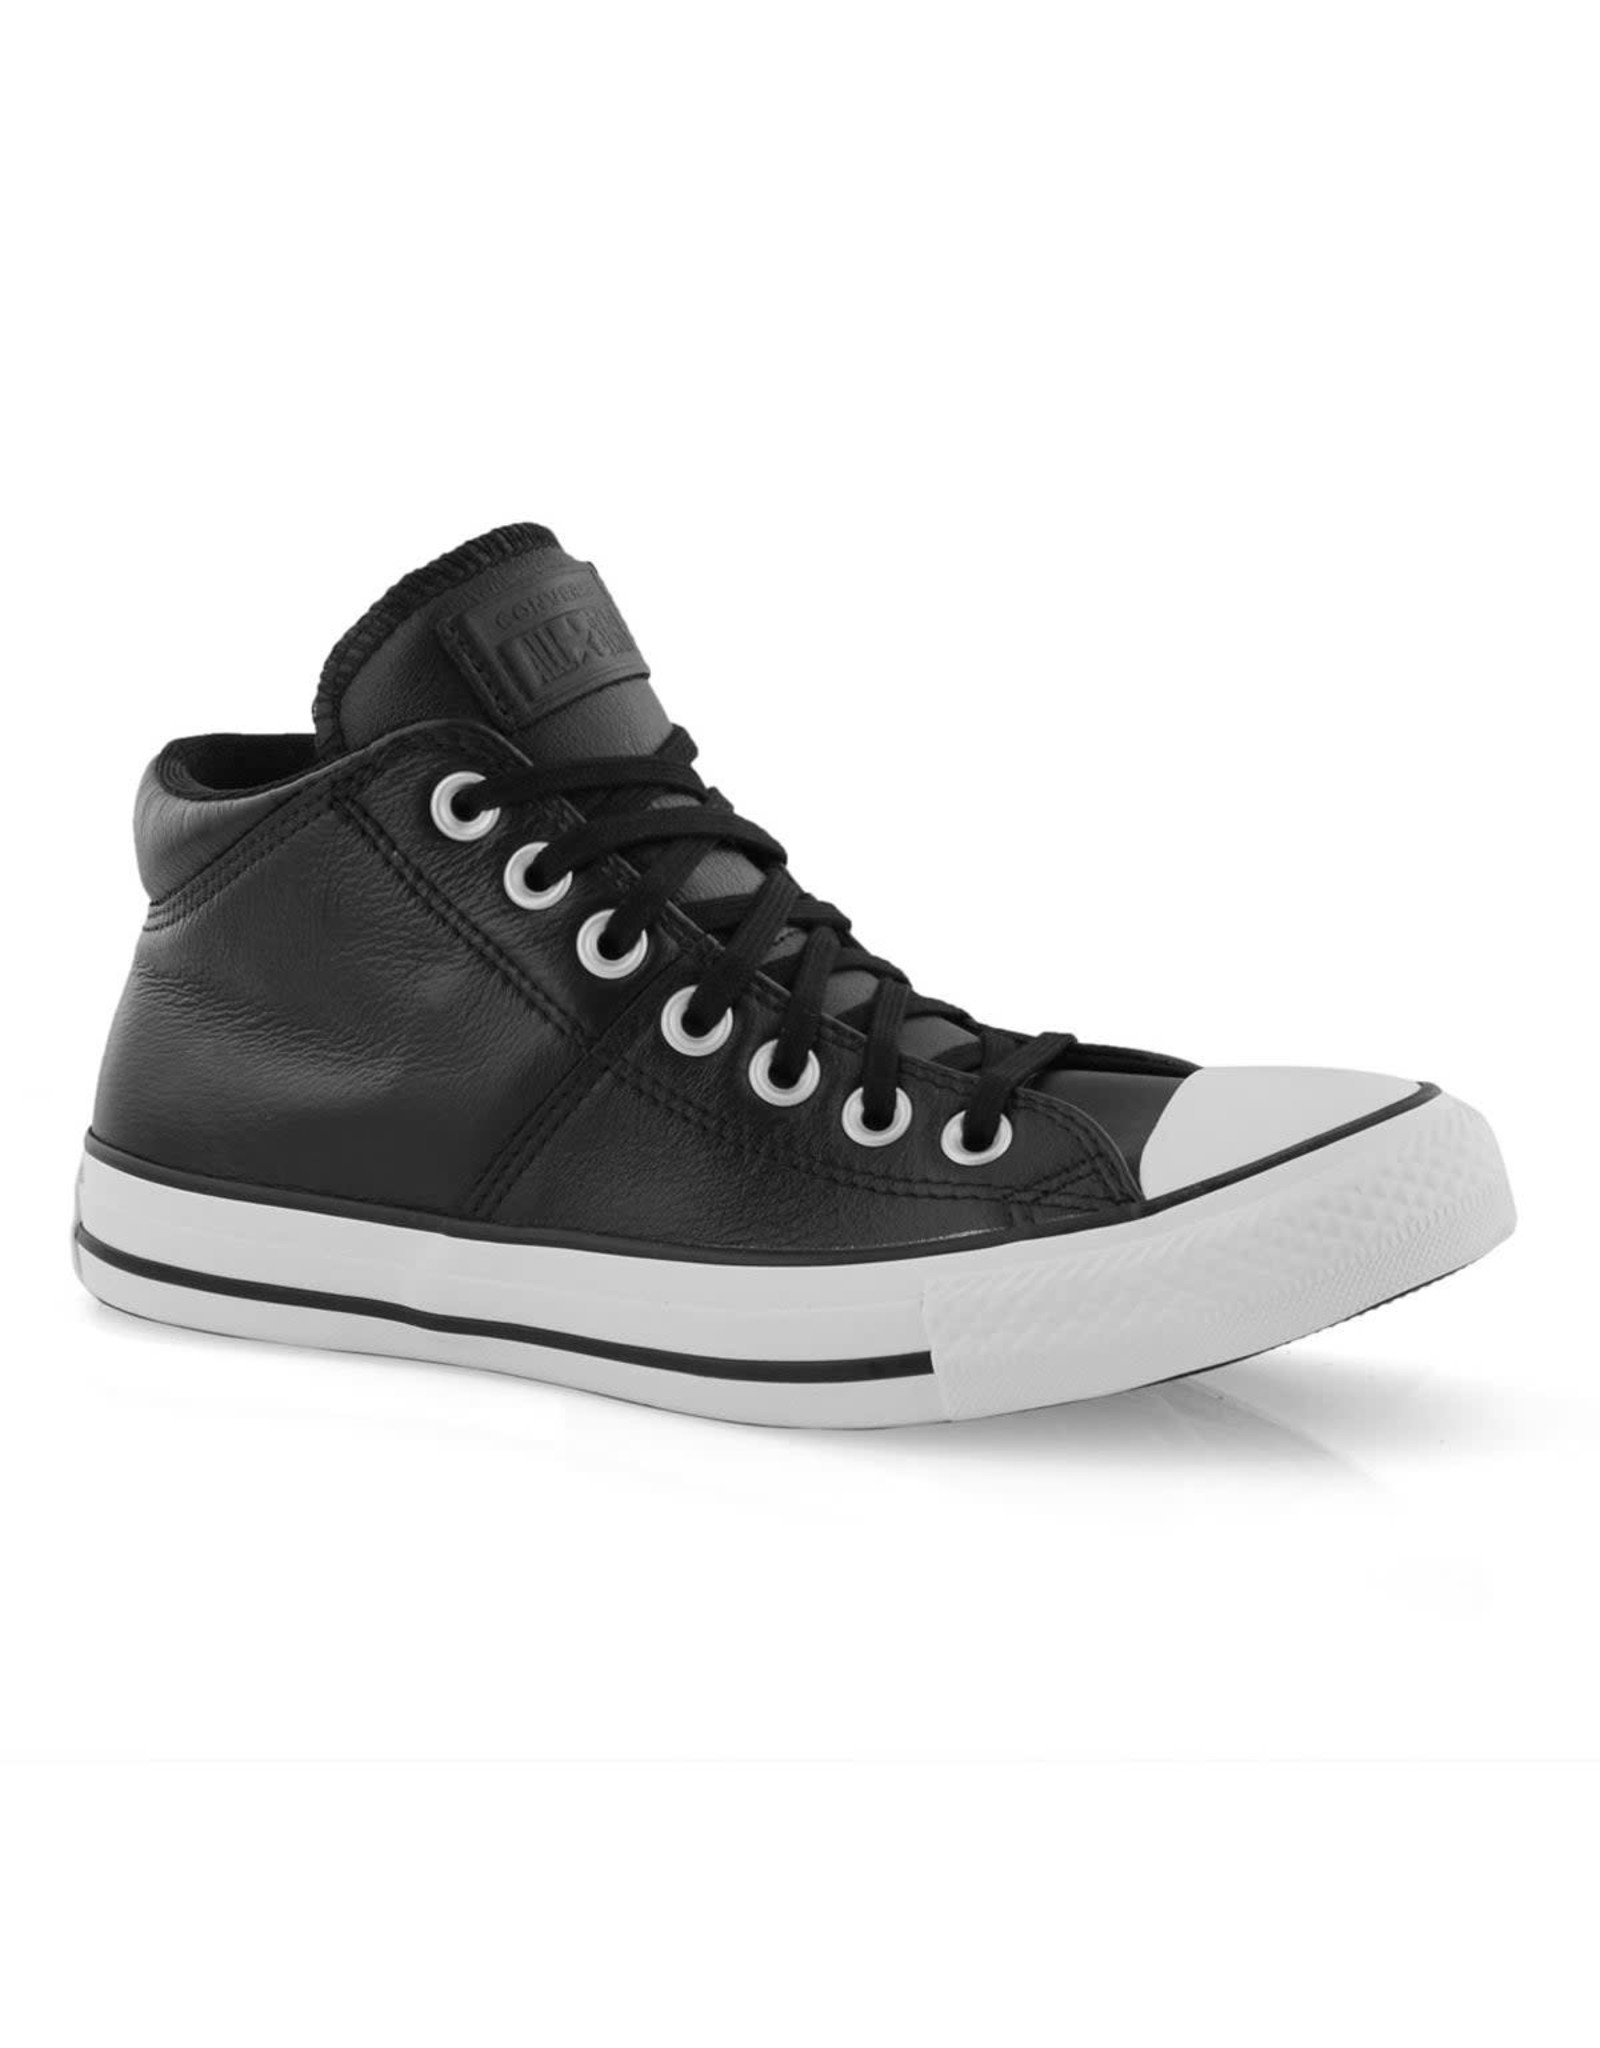 CONVERSE CHUCK TAYLOR ALL STAR MADISON MID BLACK/BLACK/WHITE CC13MA-566107C